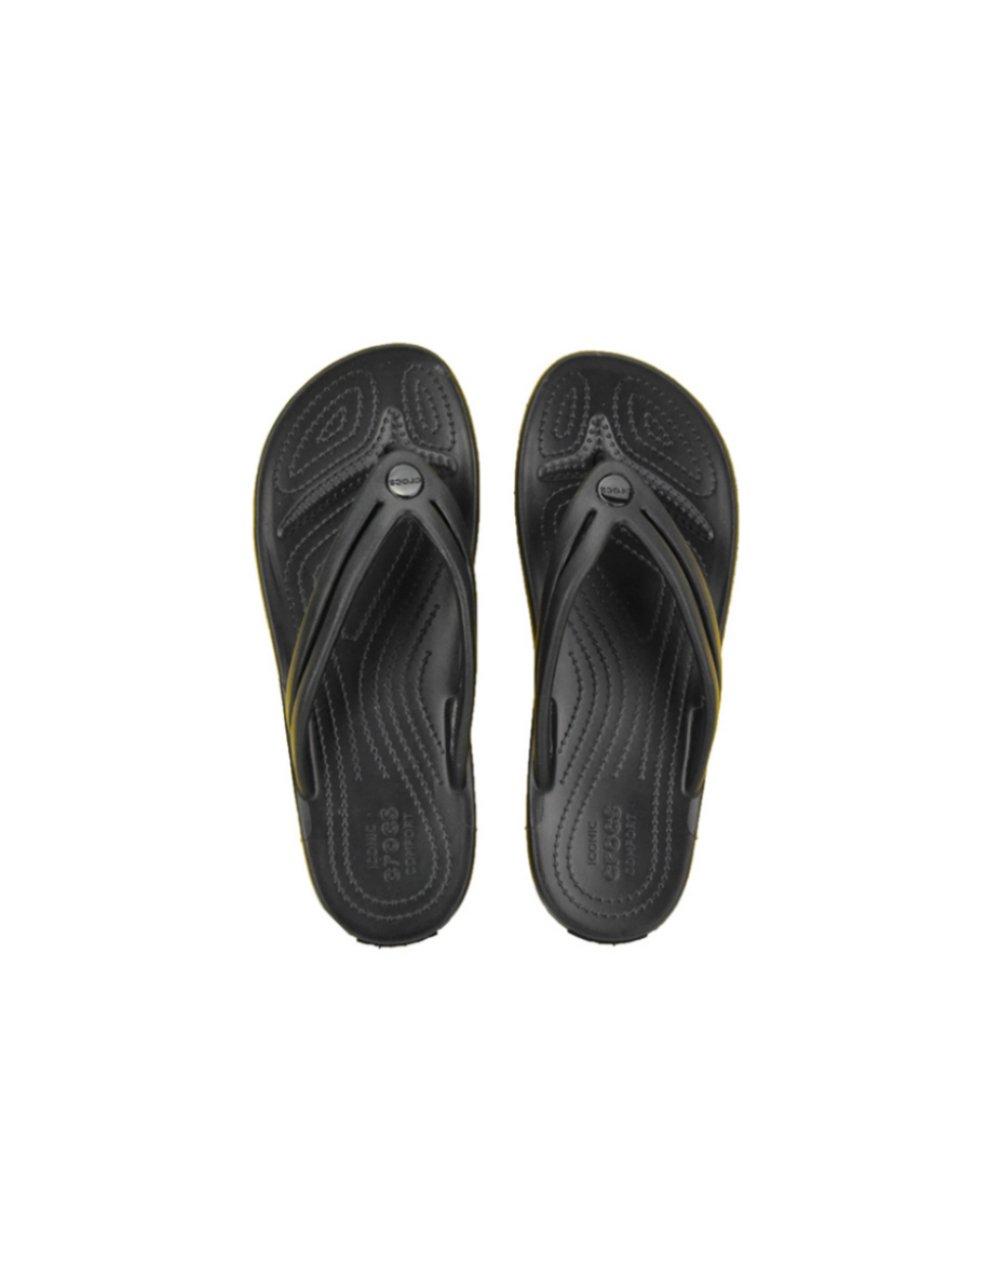 Crocs Crocband Flip W (206100-001) Black